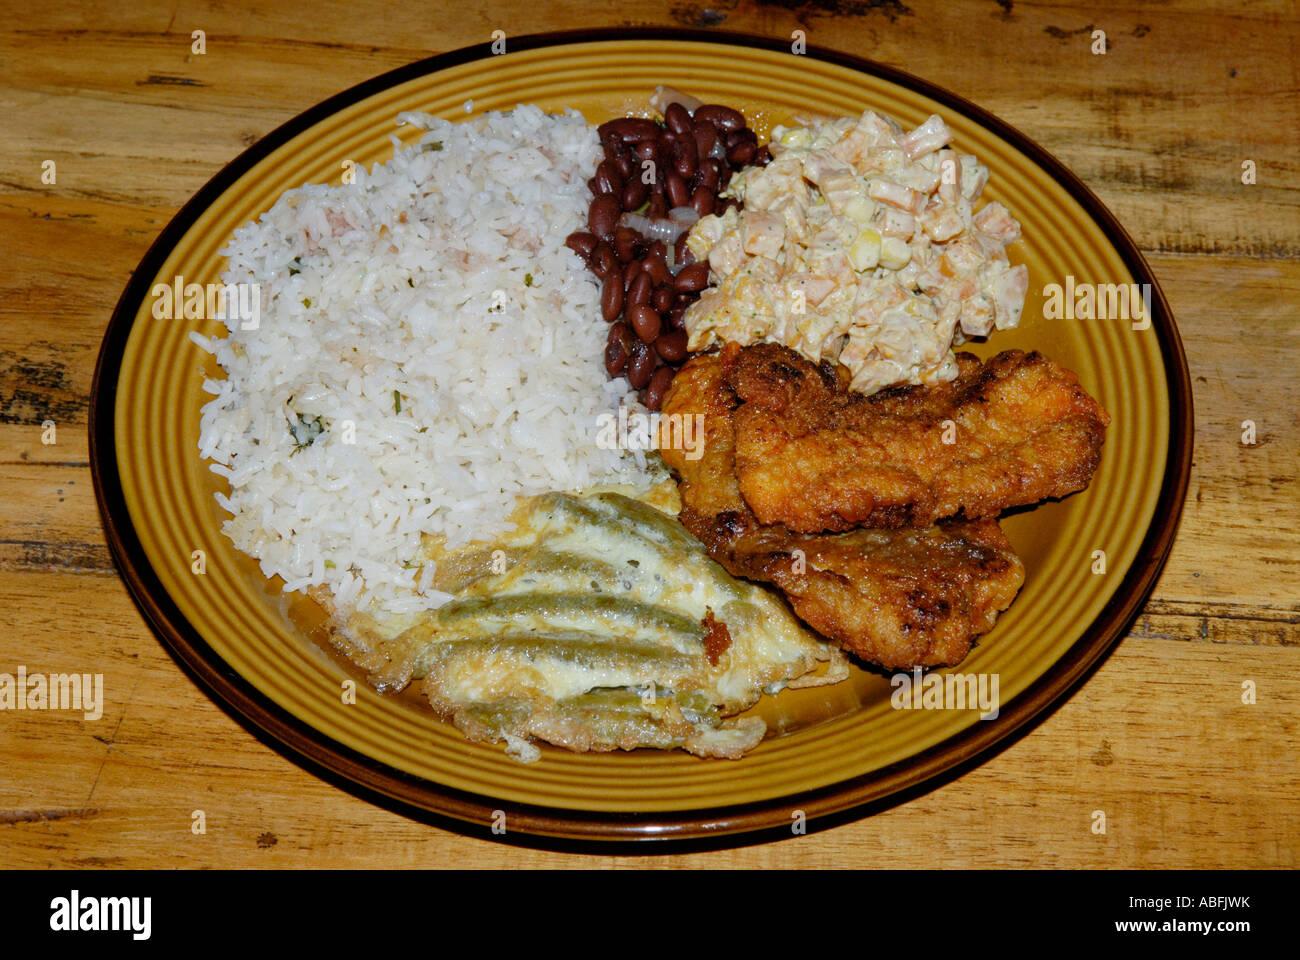 Comidas típicas costarricenses, comida tipica. Carne, verduras, arroz y frijoles (gallo pinto) Foto de stock